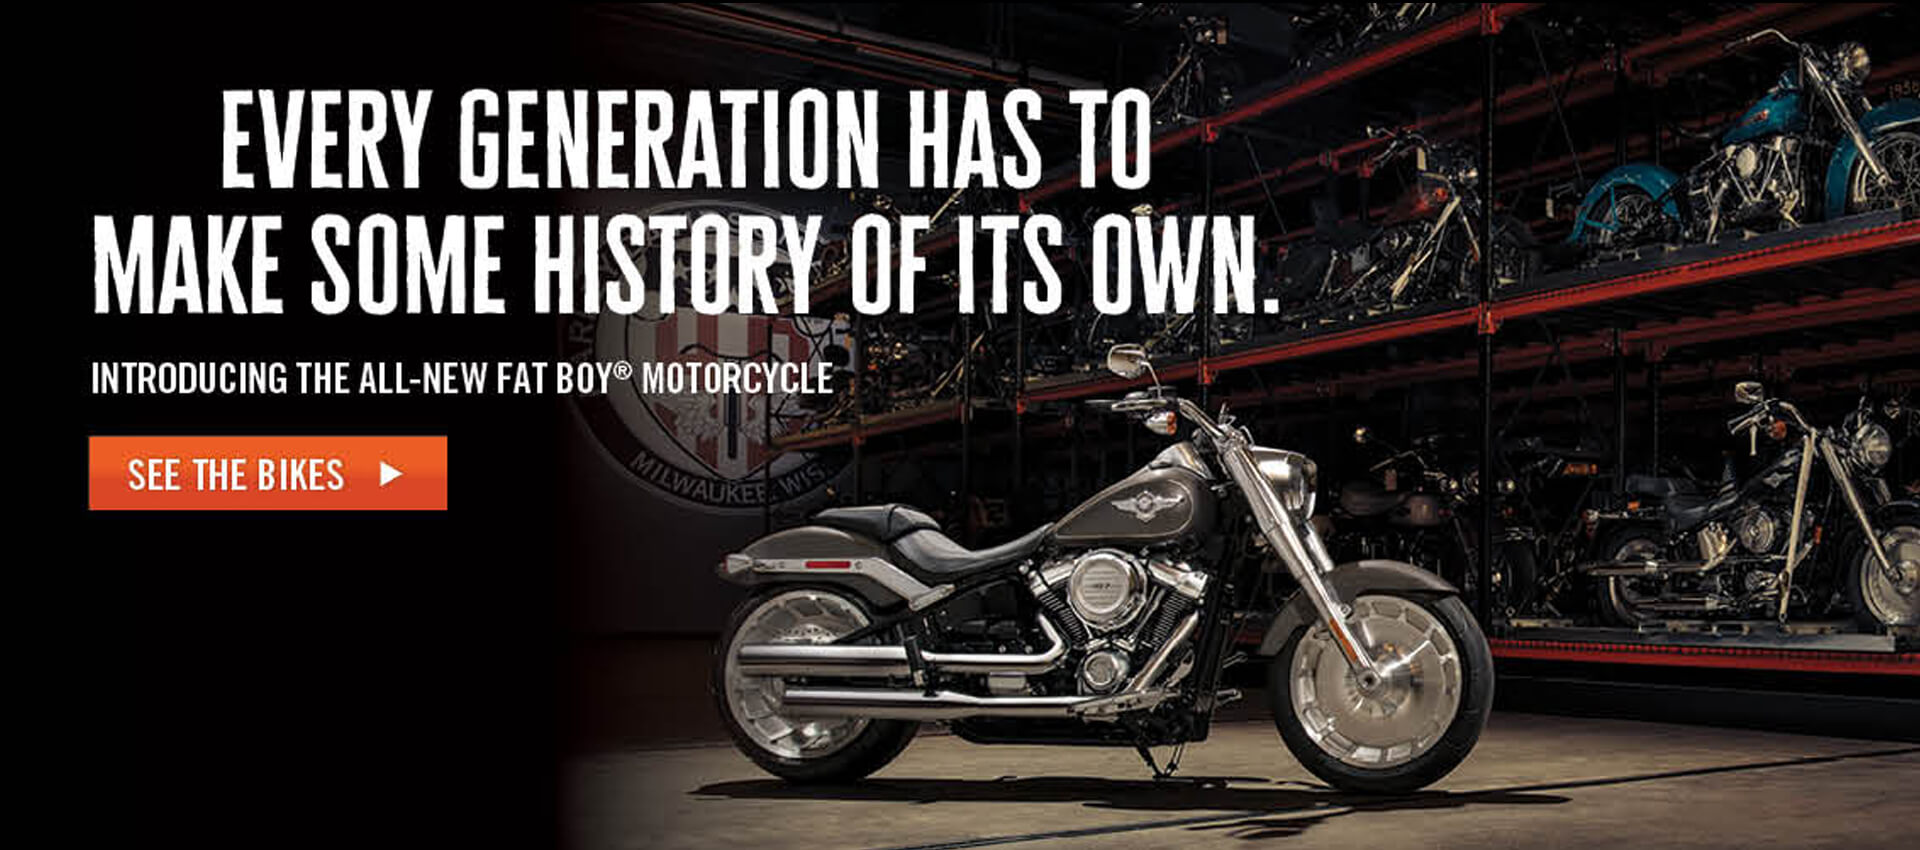 Every Generation